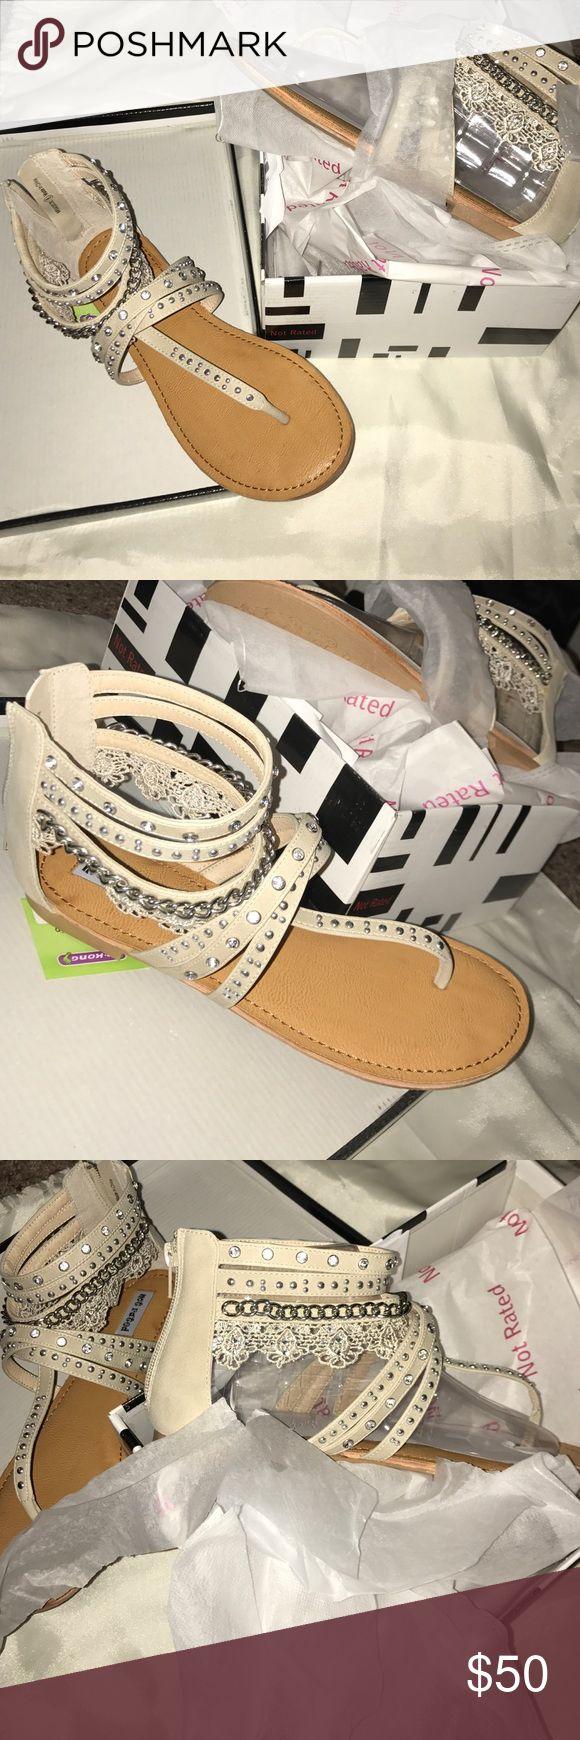 White Boutique Sandals Size 8 White Boutique Sandals Size 8 Not Rated Shoes Sandals